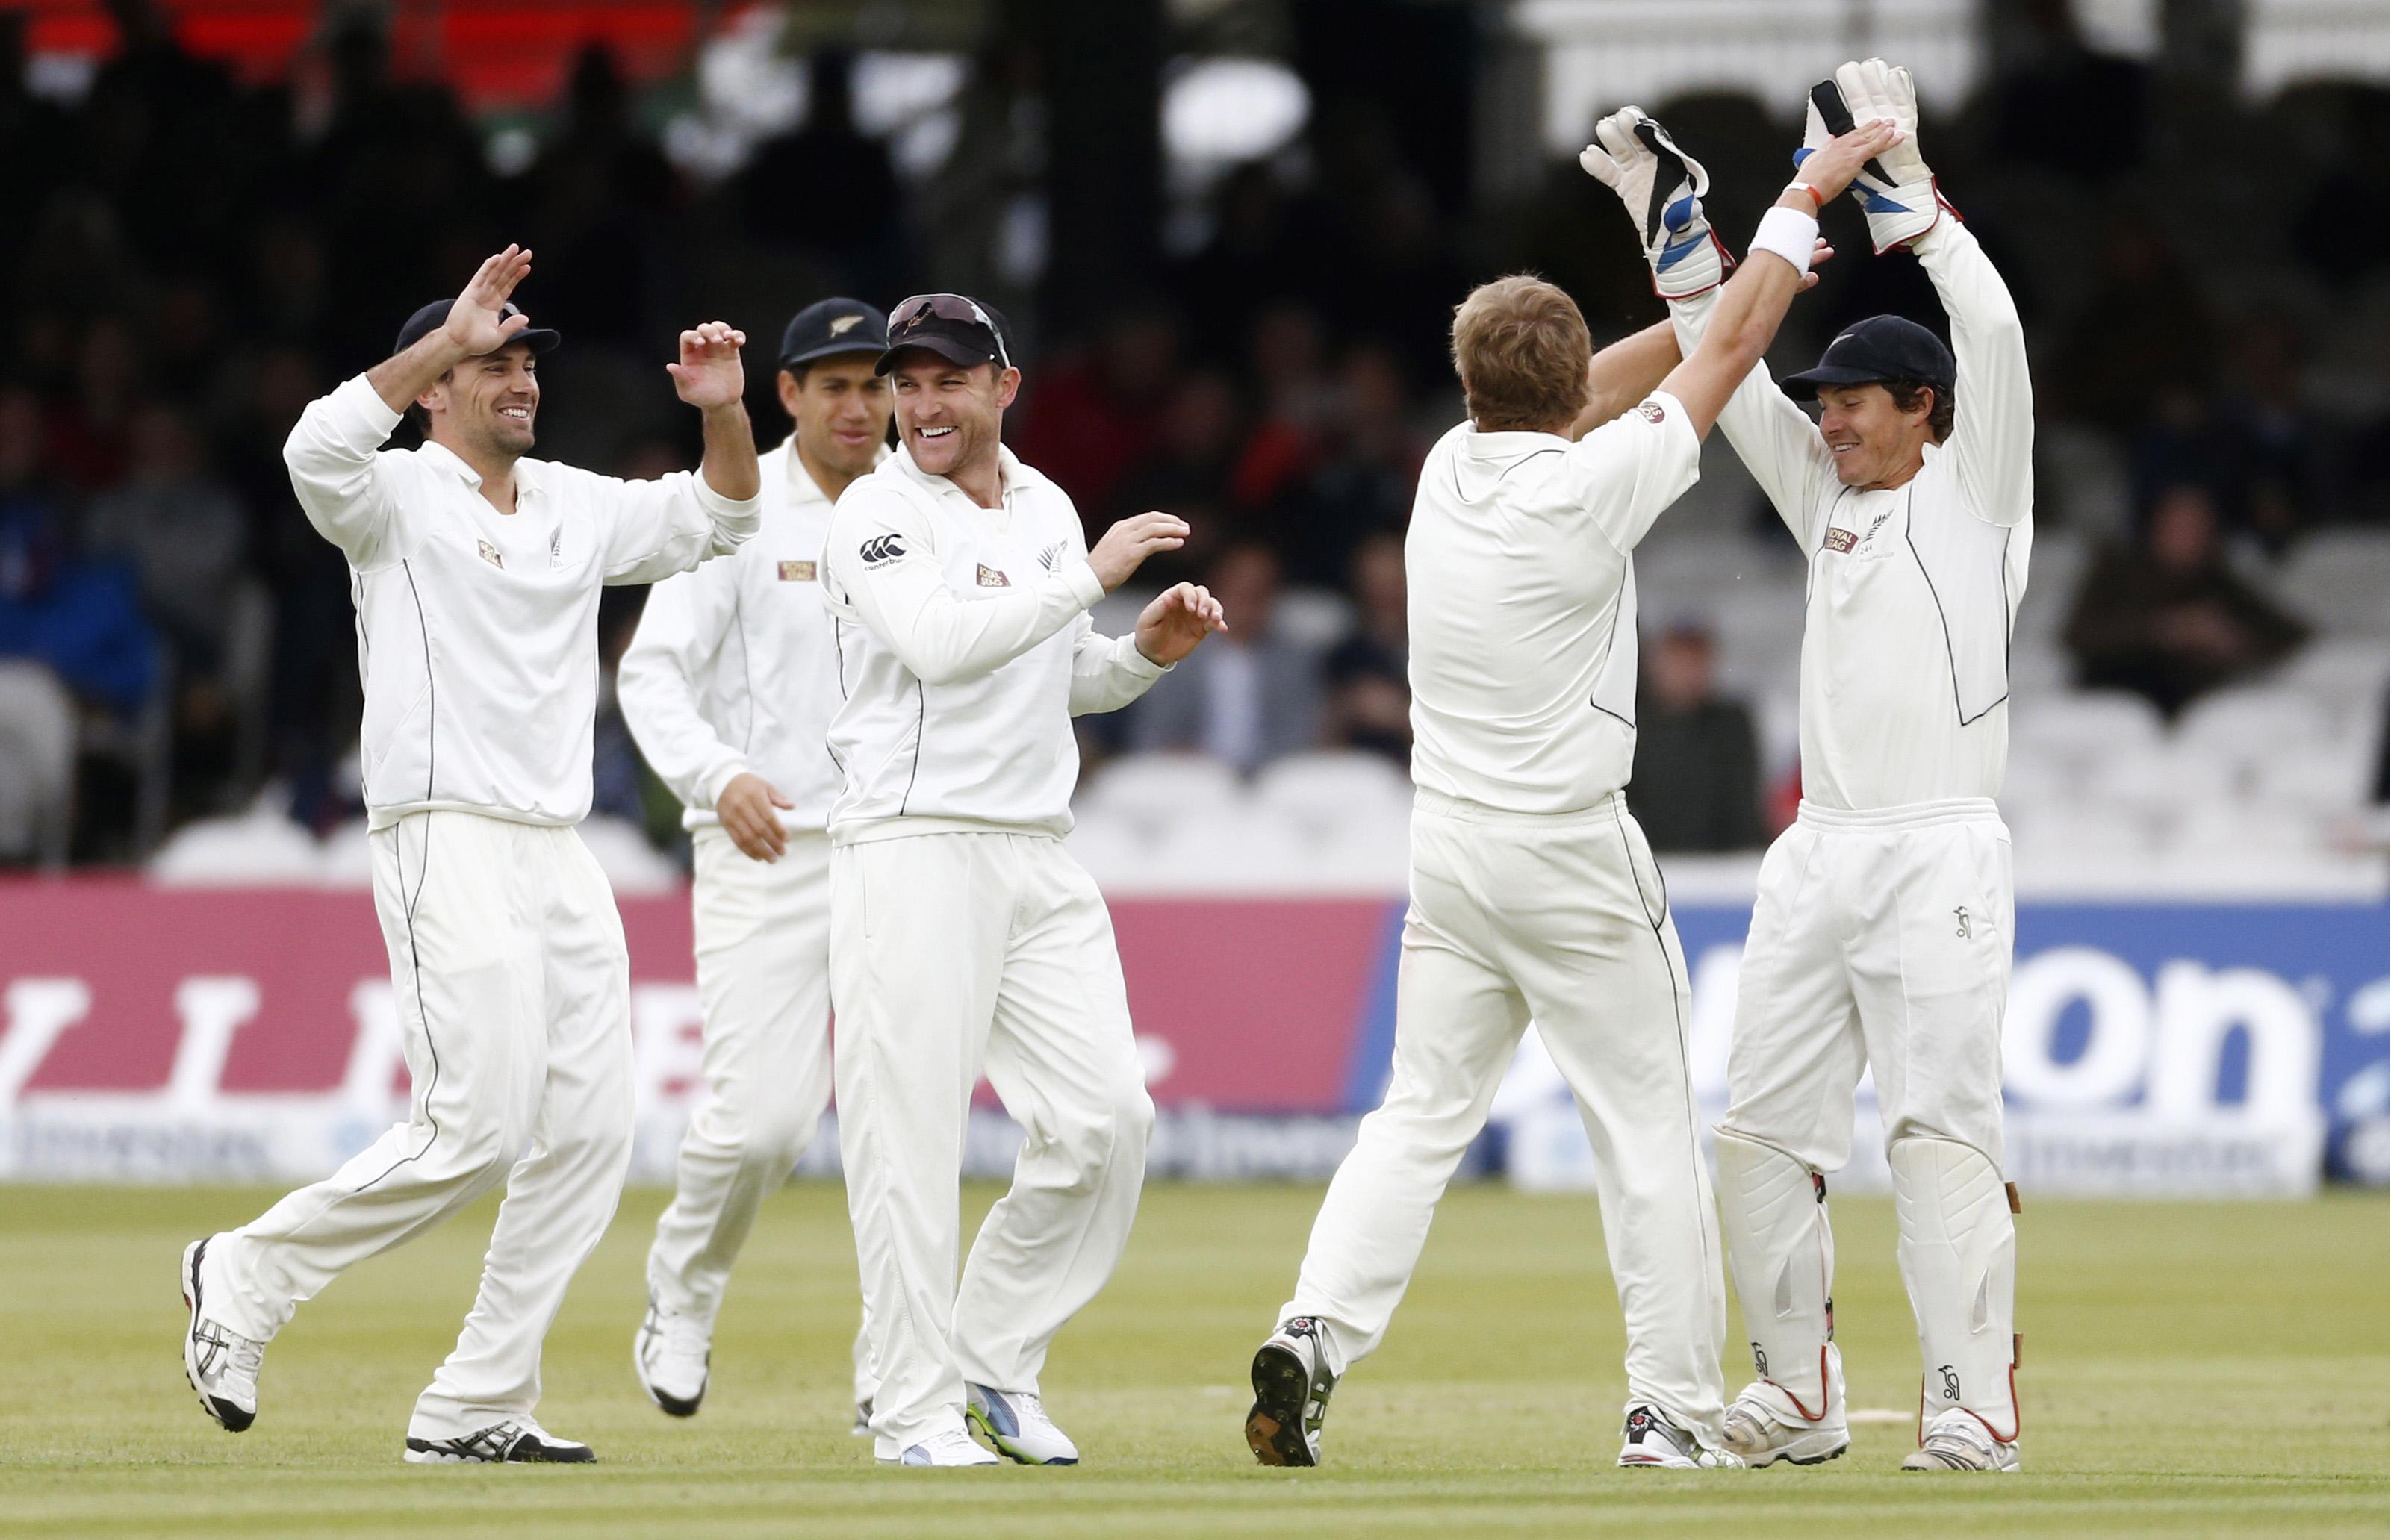 आईसीसी टेस्ट रैंकिंग- न्यूजीलैंड के तेज गेंदबाज नील वेगनर की अभूतपूर्व छलांग, तो विराट कोहली की बढ़ी चिंता 11